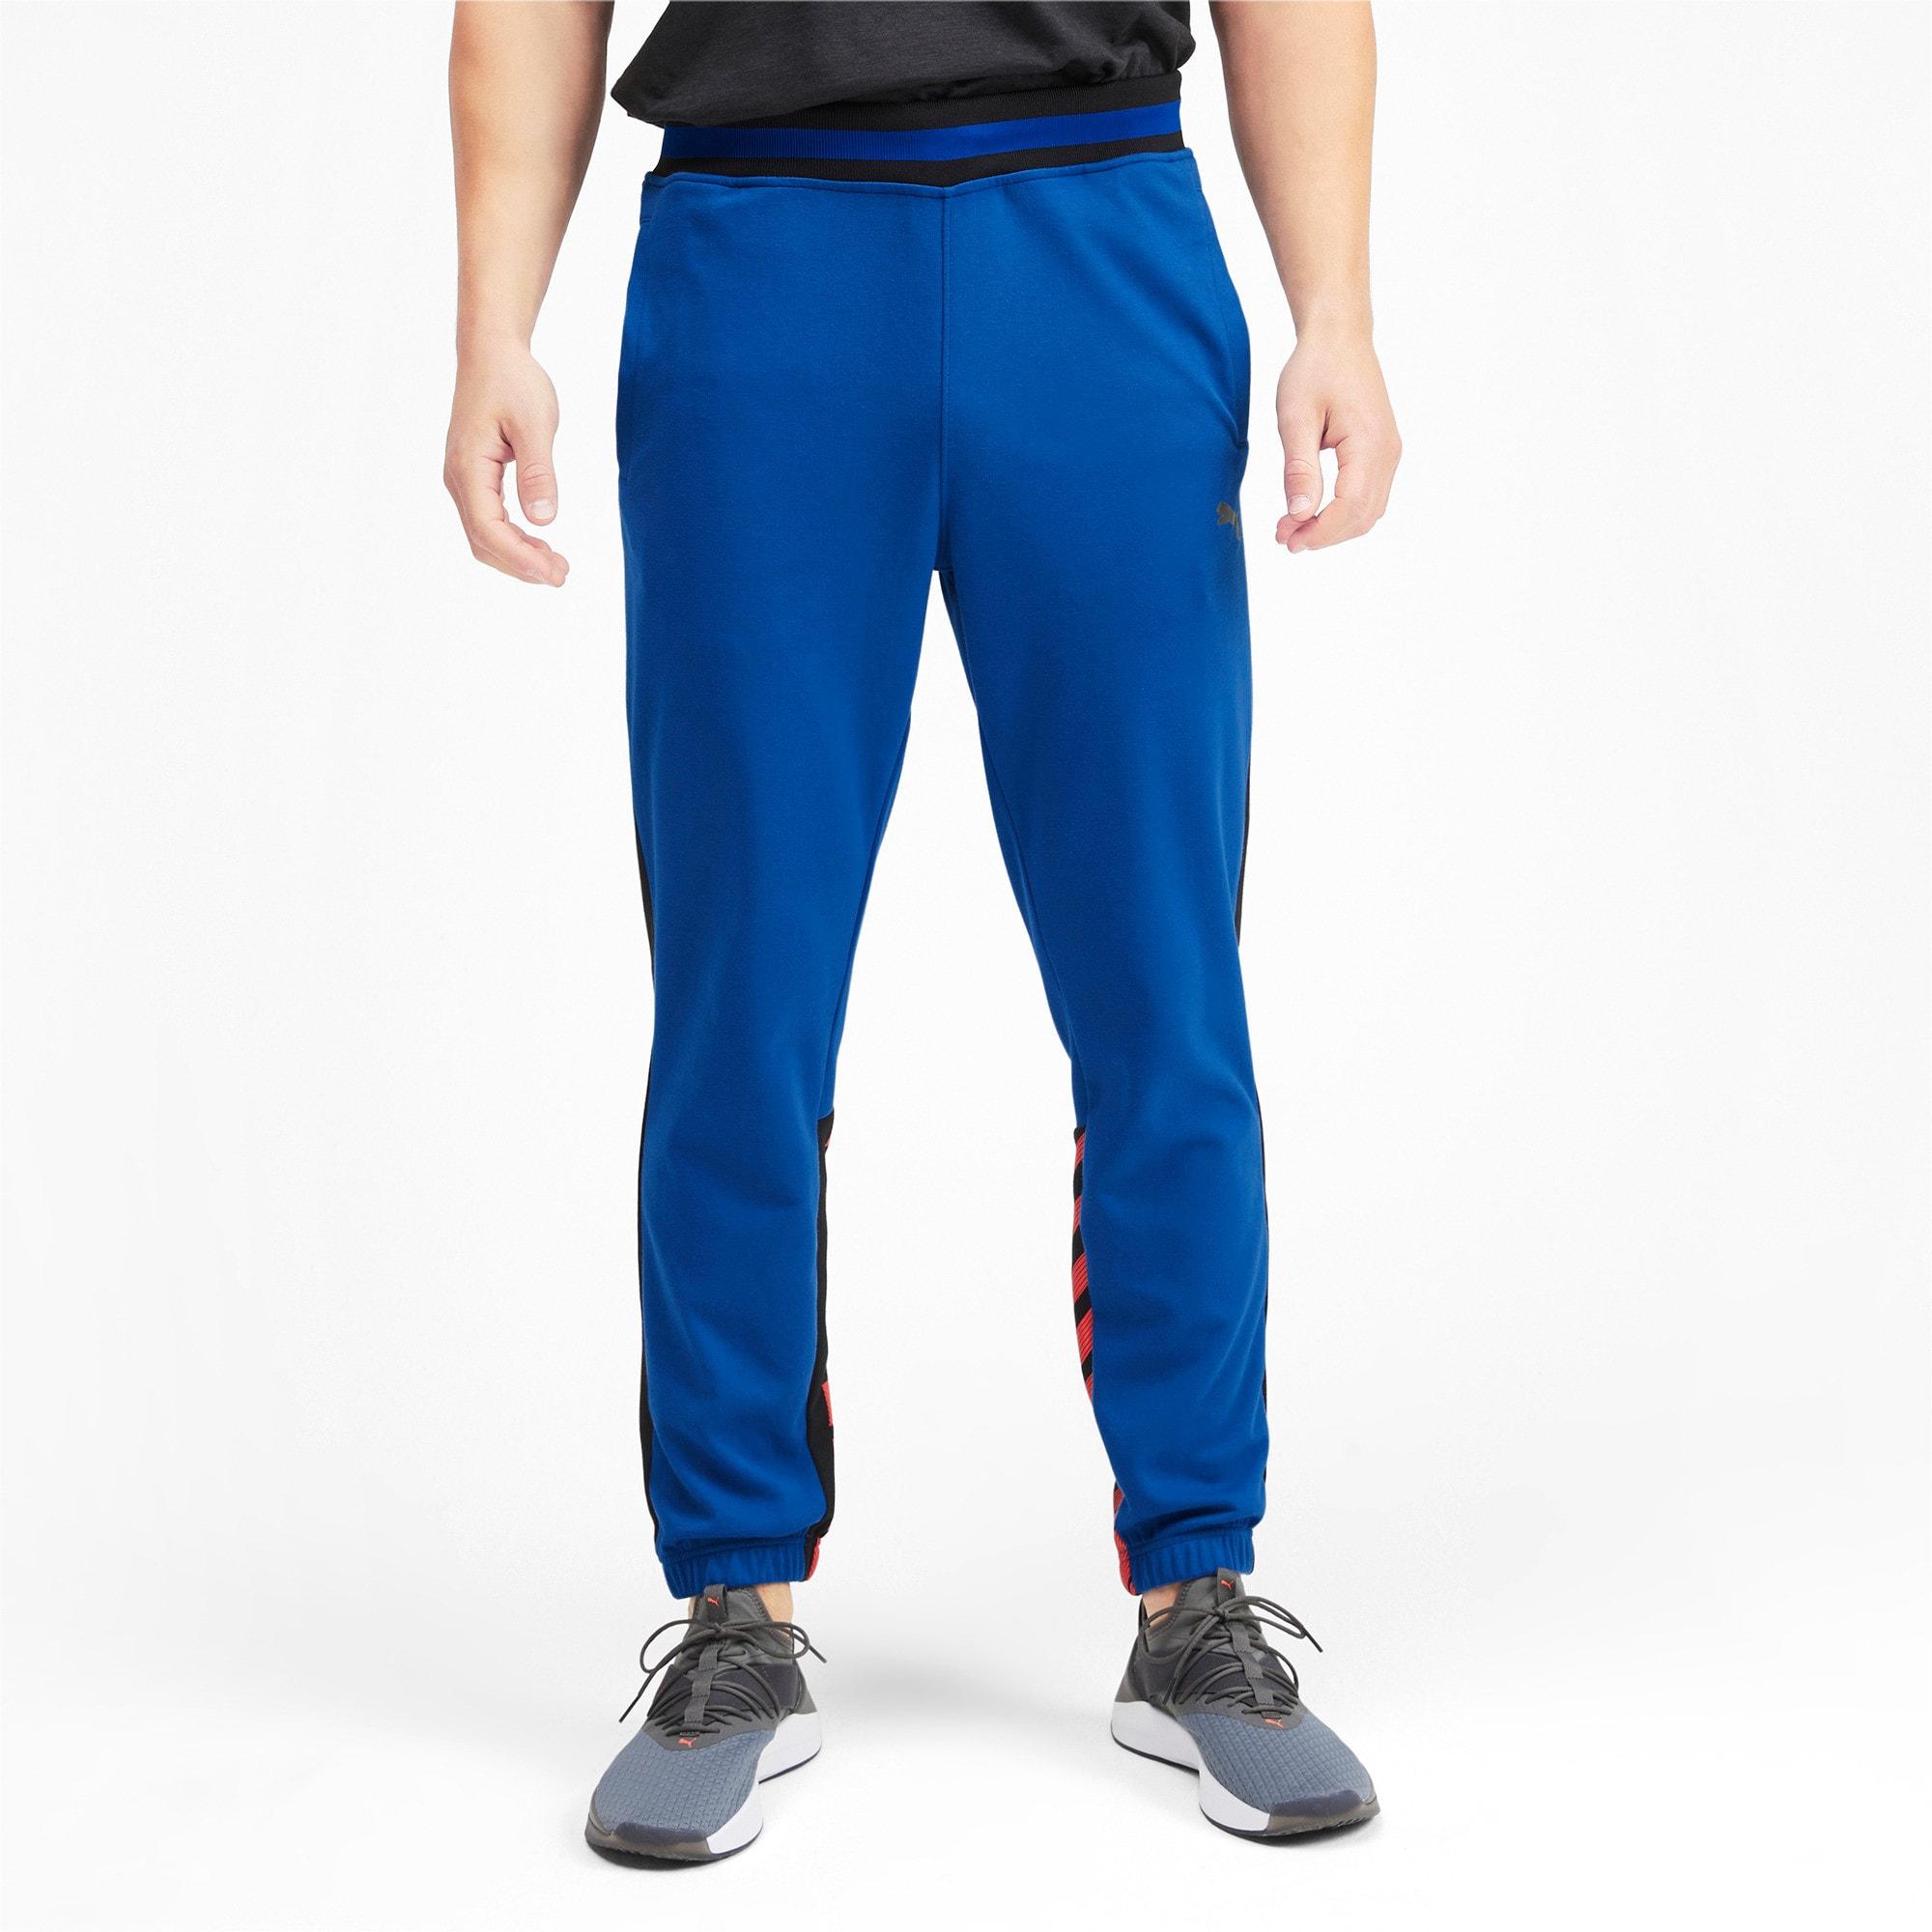 Thumbnail 2 of Collective Men's Sweatpants, Galaxy Blue, medium